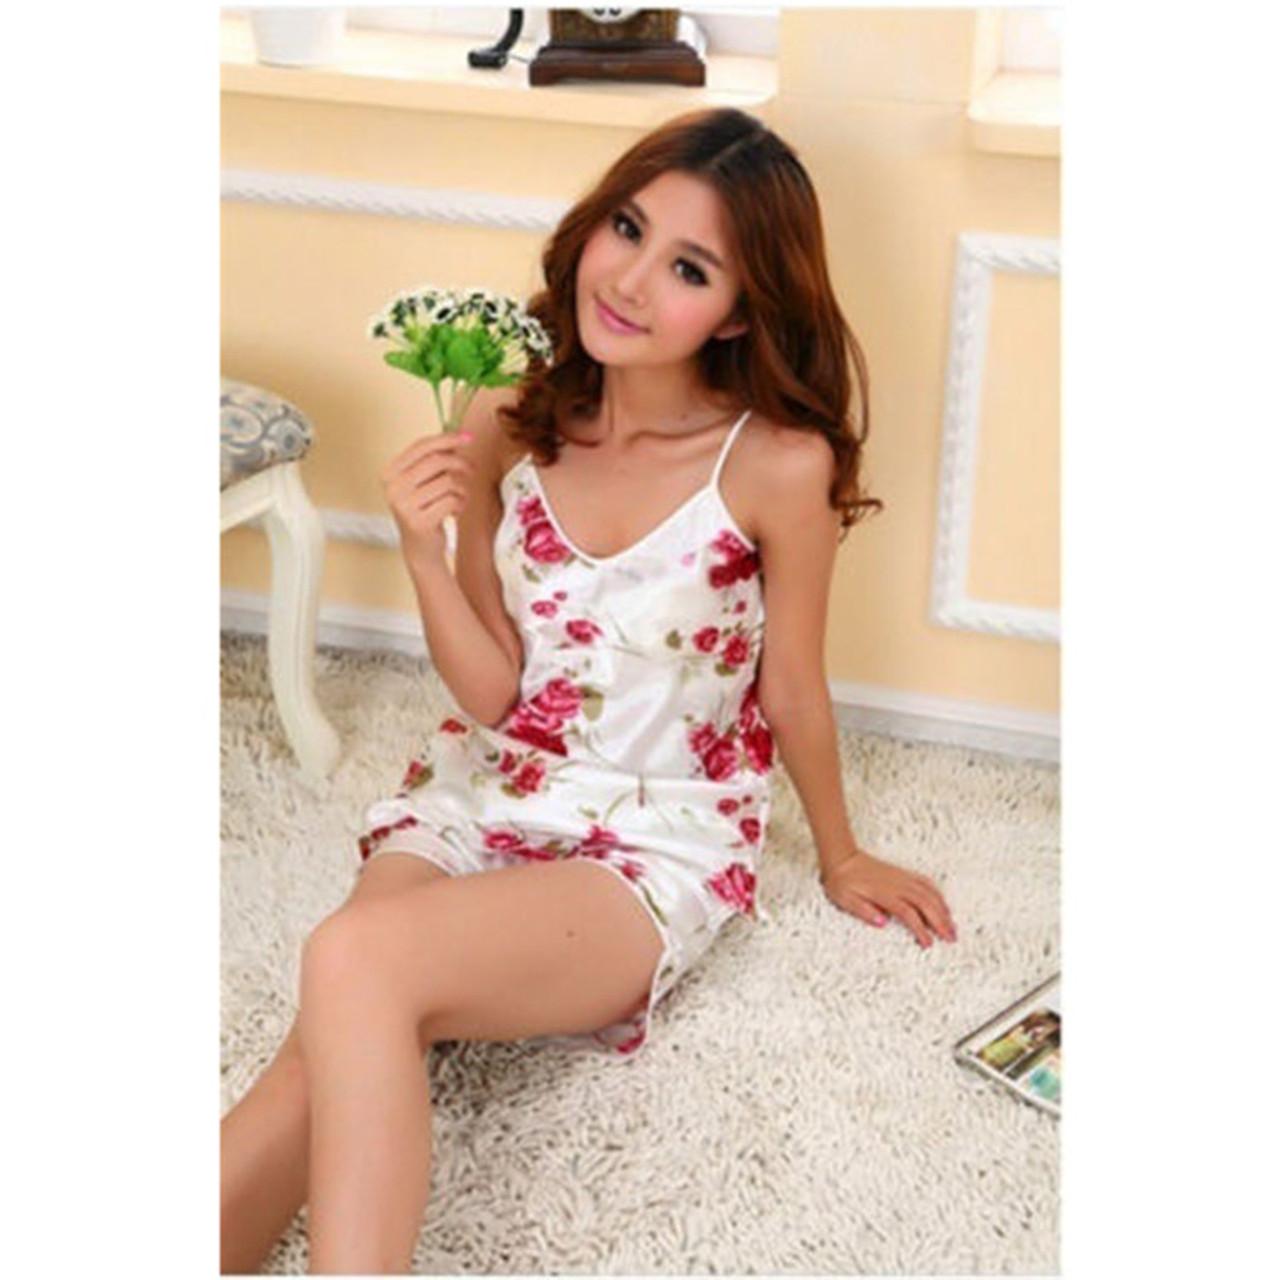 fc98a94c0d ... Sexy Flower Sleepwear Braces Shirts + Shorts Underwear Pajamas Robes  Set for woman vetement femme ...